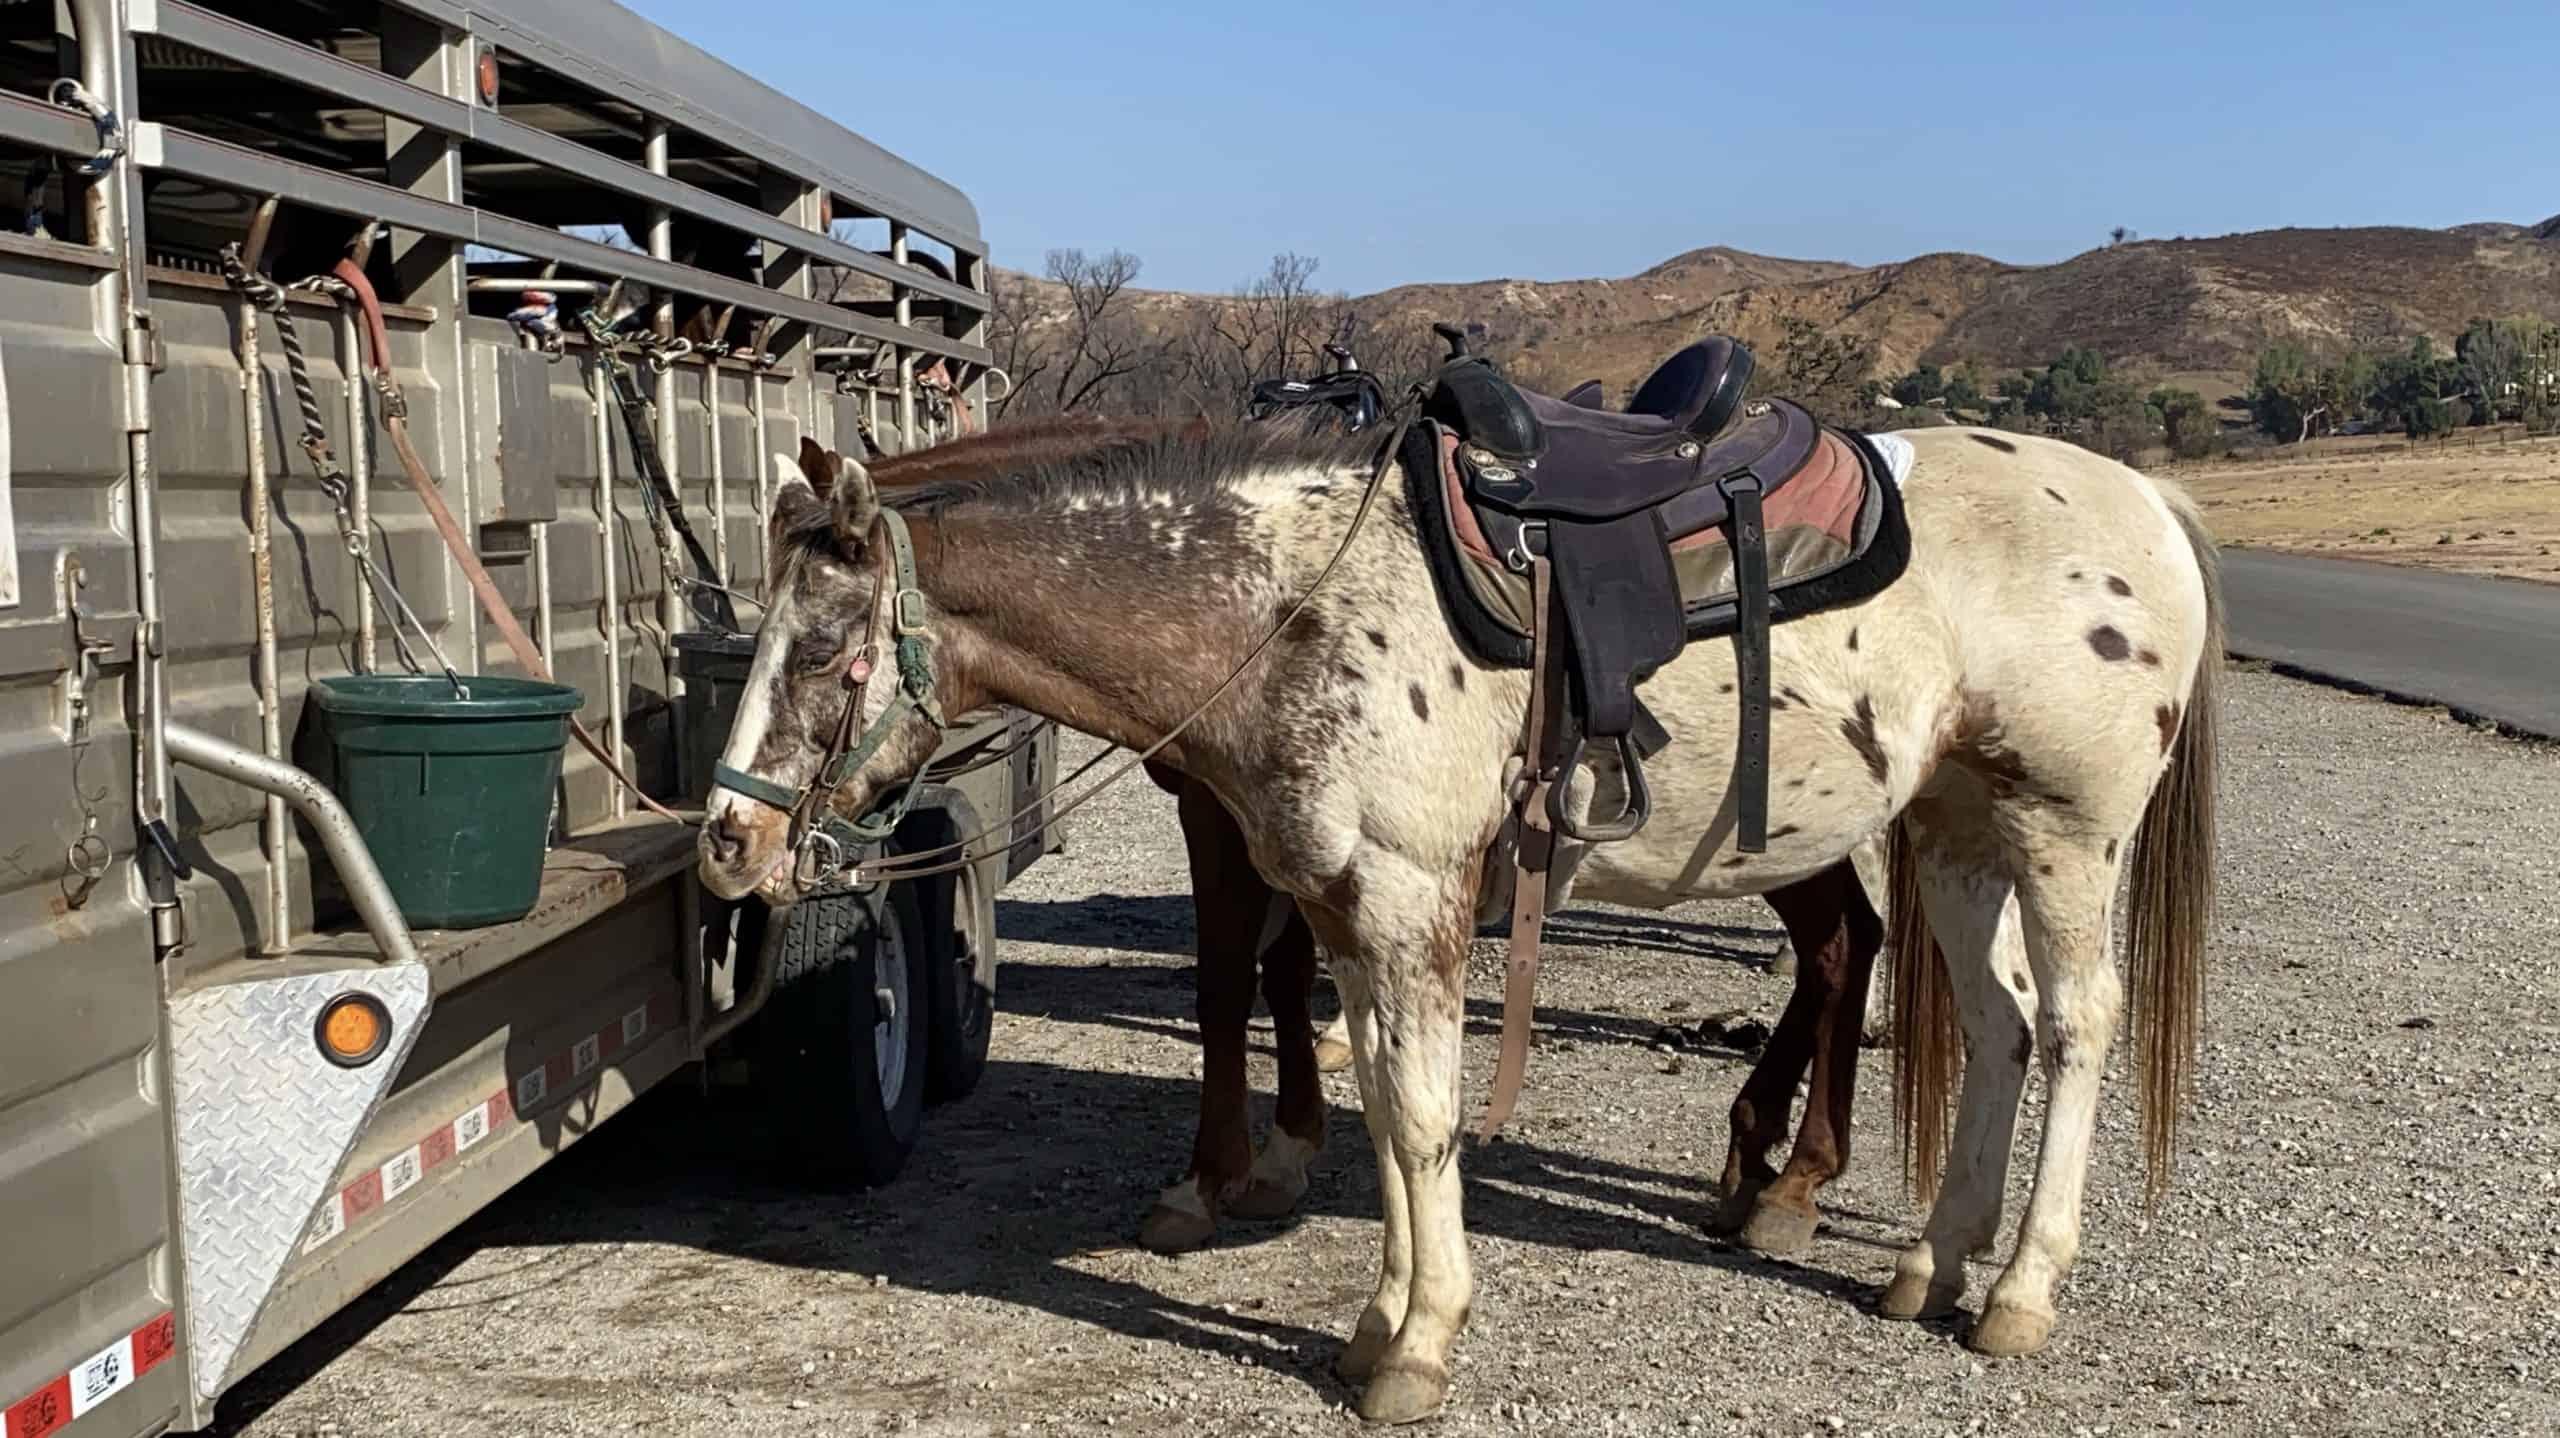 Malibu Riders